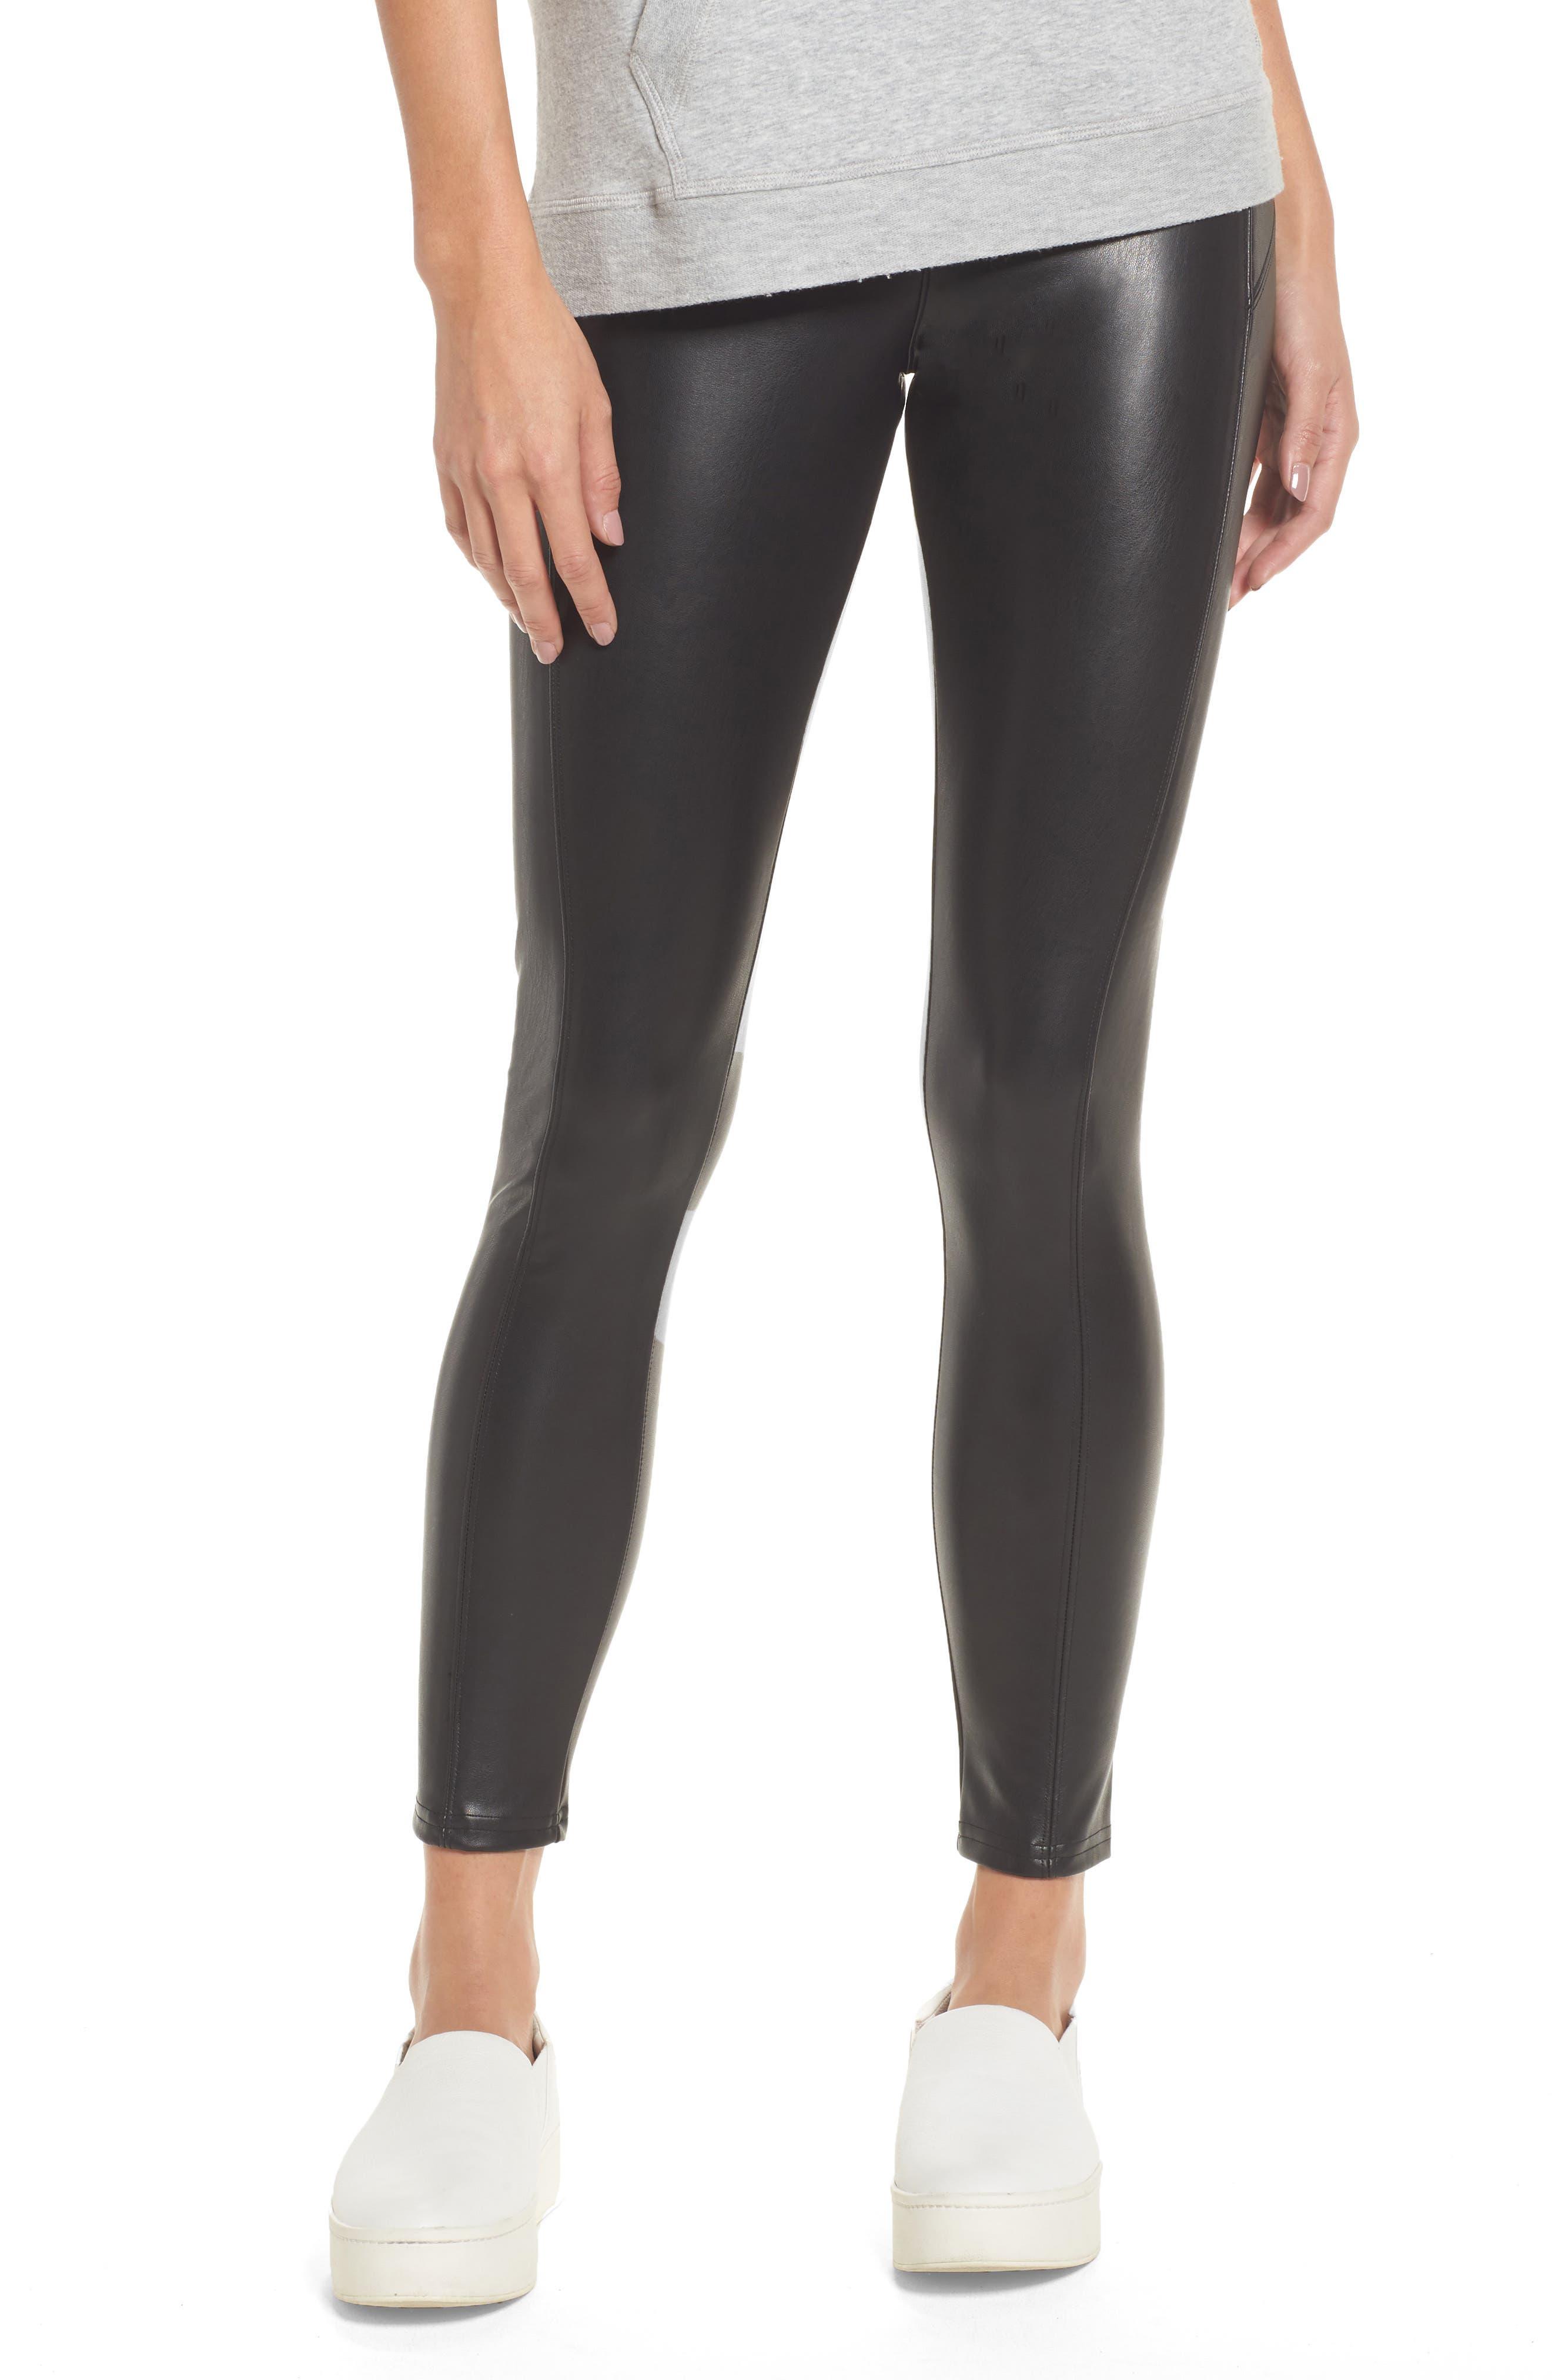 Nordstrom Faux Leather Leggings, Black